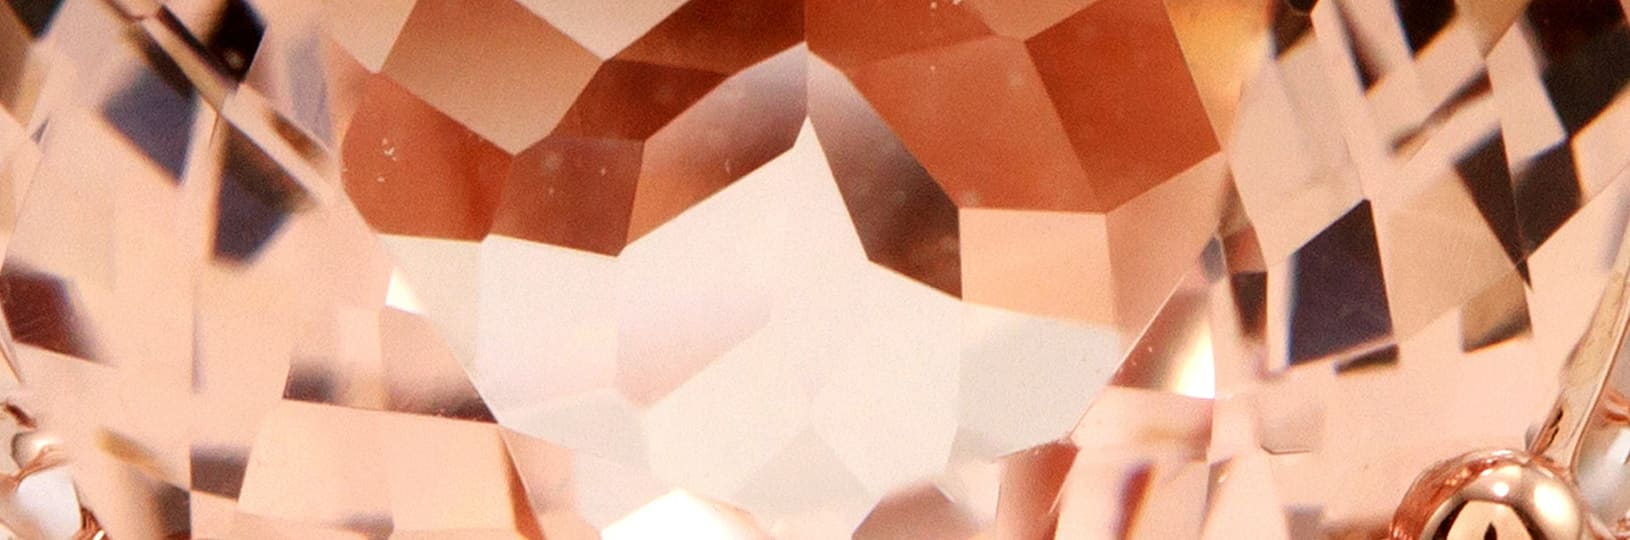 Morganite is beloved for its romantic pink hue